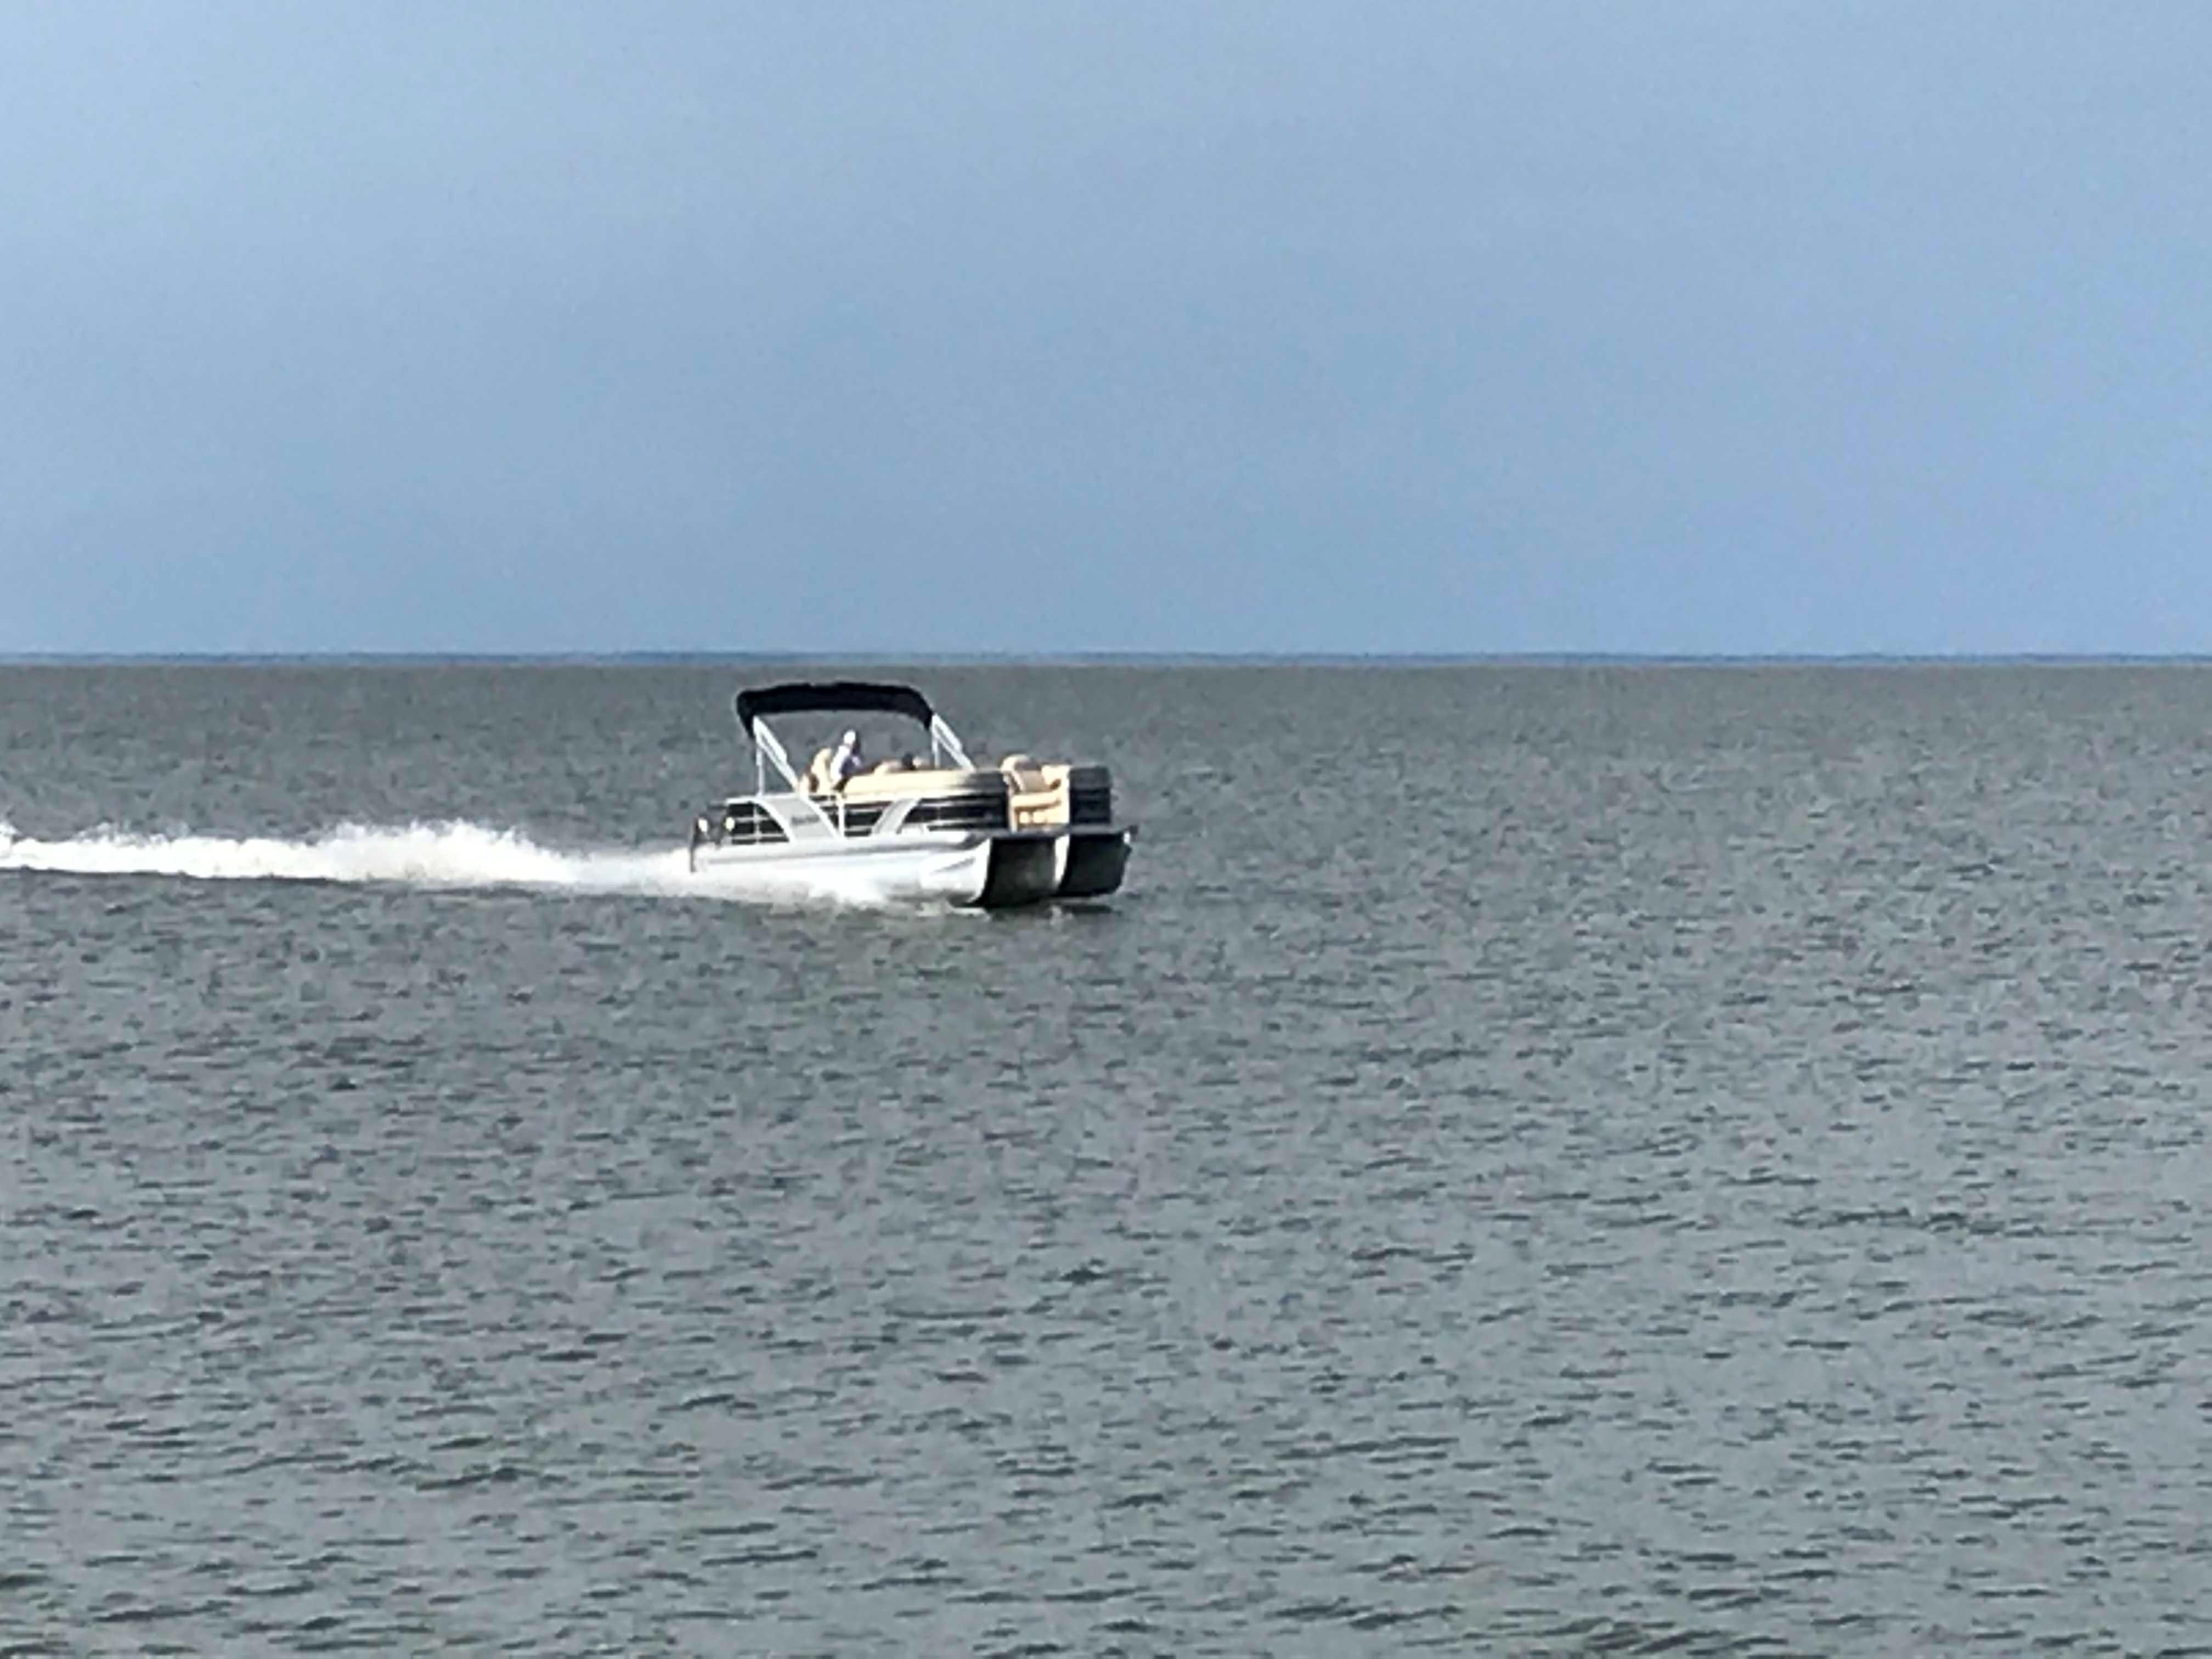 Godfrey Aqua Patio - At Speed 40 mph+